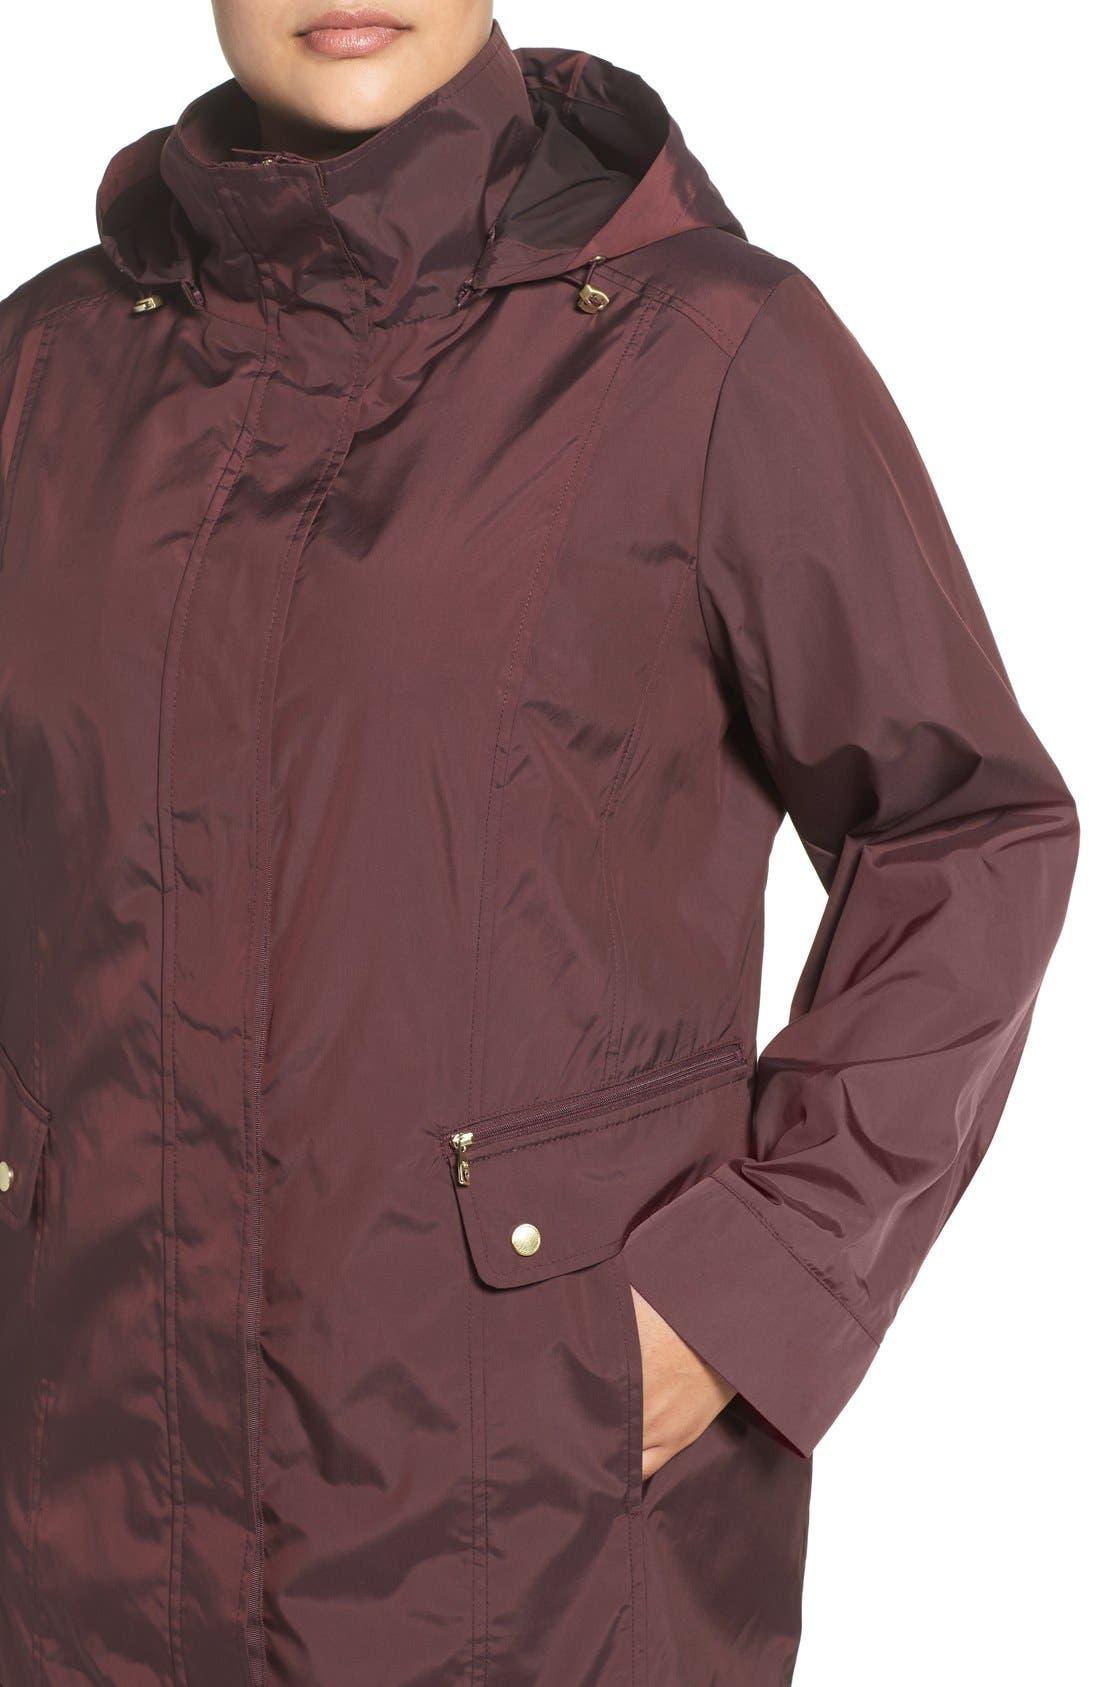 Cole Haan Water Resistant Rain Jacket,                             Alternate thumbnail 4, color,                             Eggplant